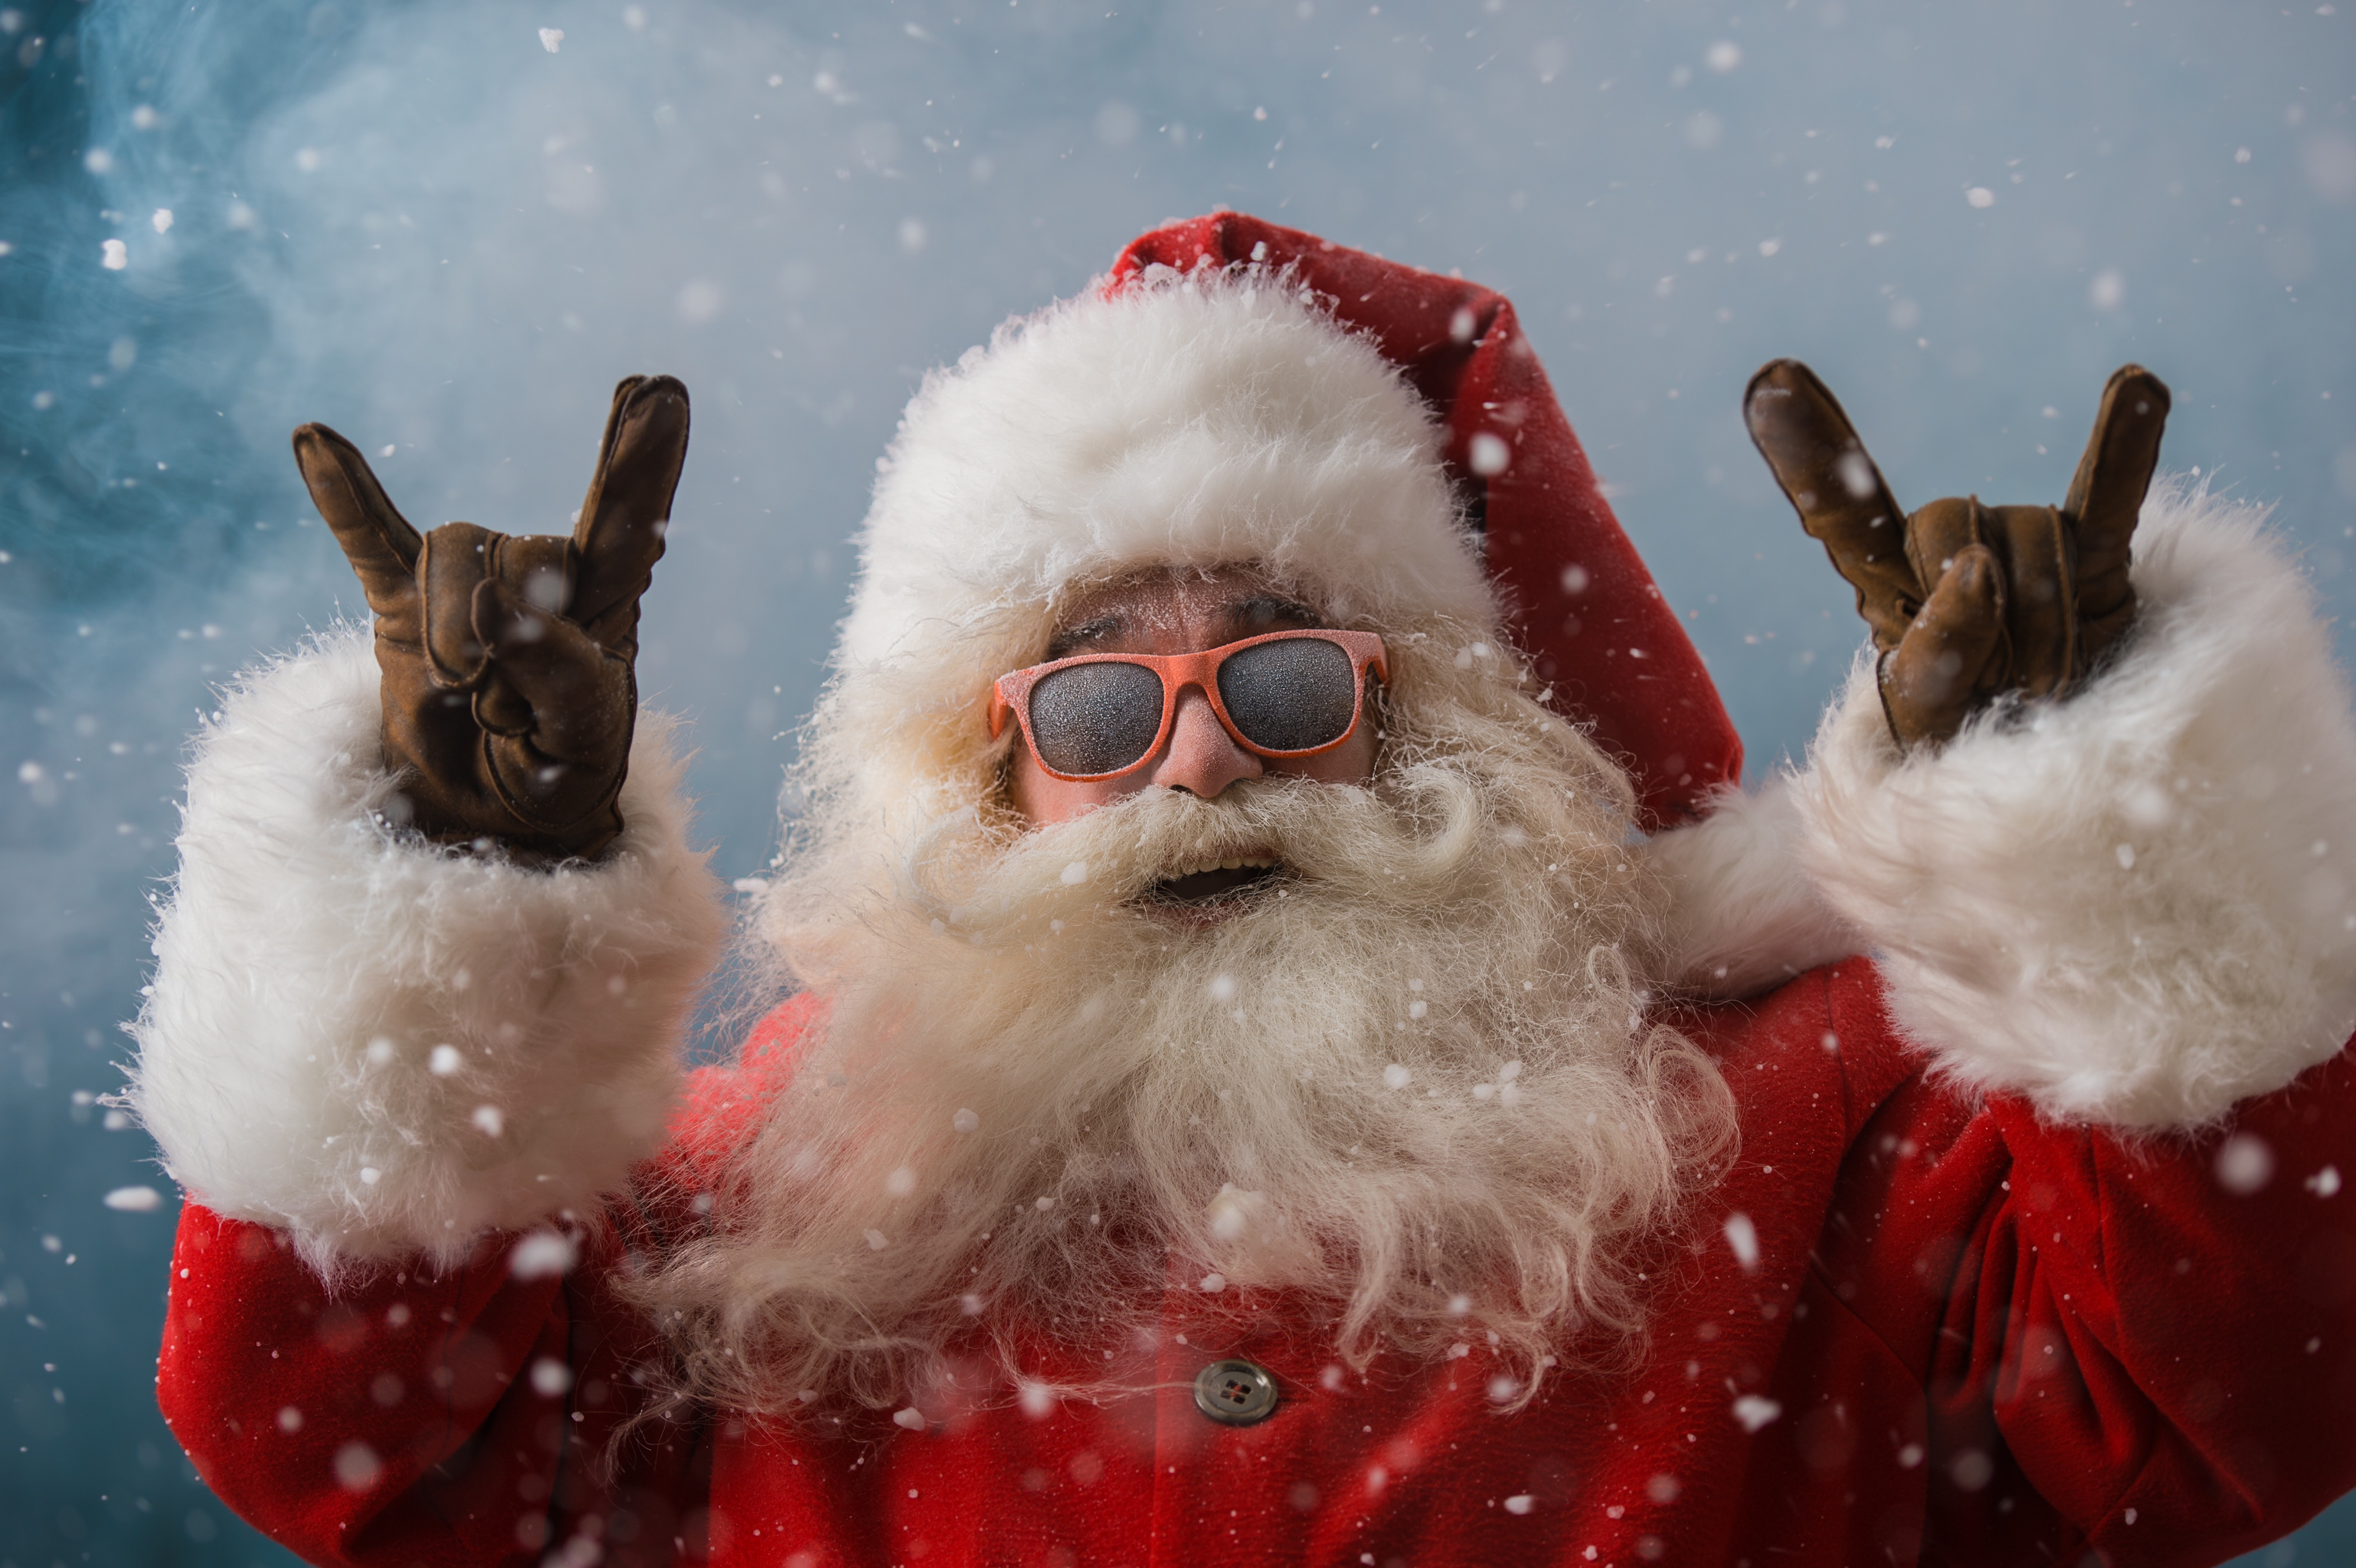 cool santa claus 4k 1630066939 - Cool Santa Claus 4k - Cool Santa Claus wallpapers, Cool Santa Claus 4k wallpapers